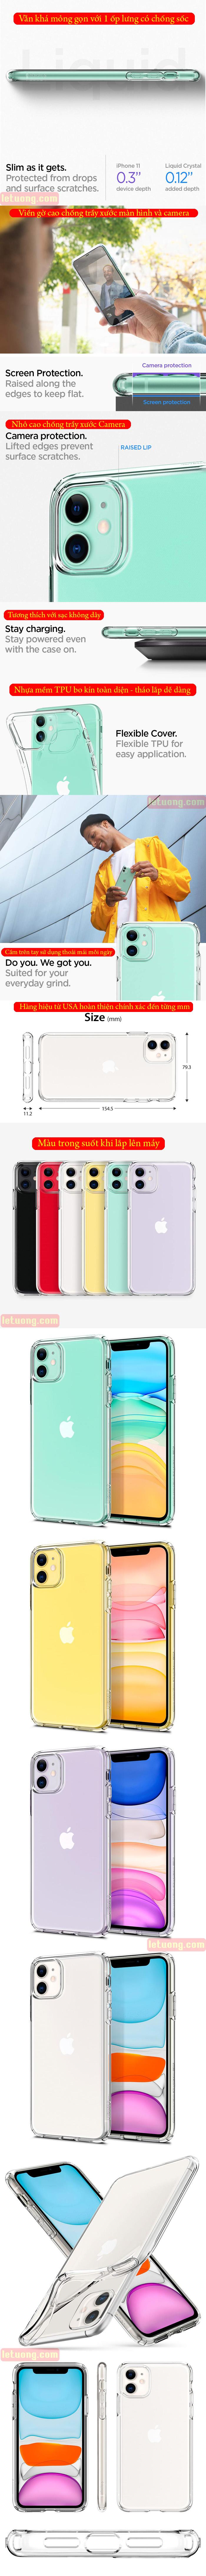 Ốp lưng iPhone 11 Spigen Liquid Crystal nhựa mềm trong suốt ( USA ) 4